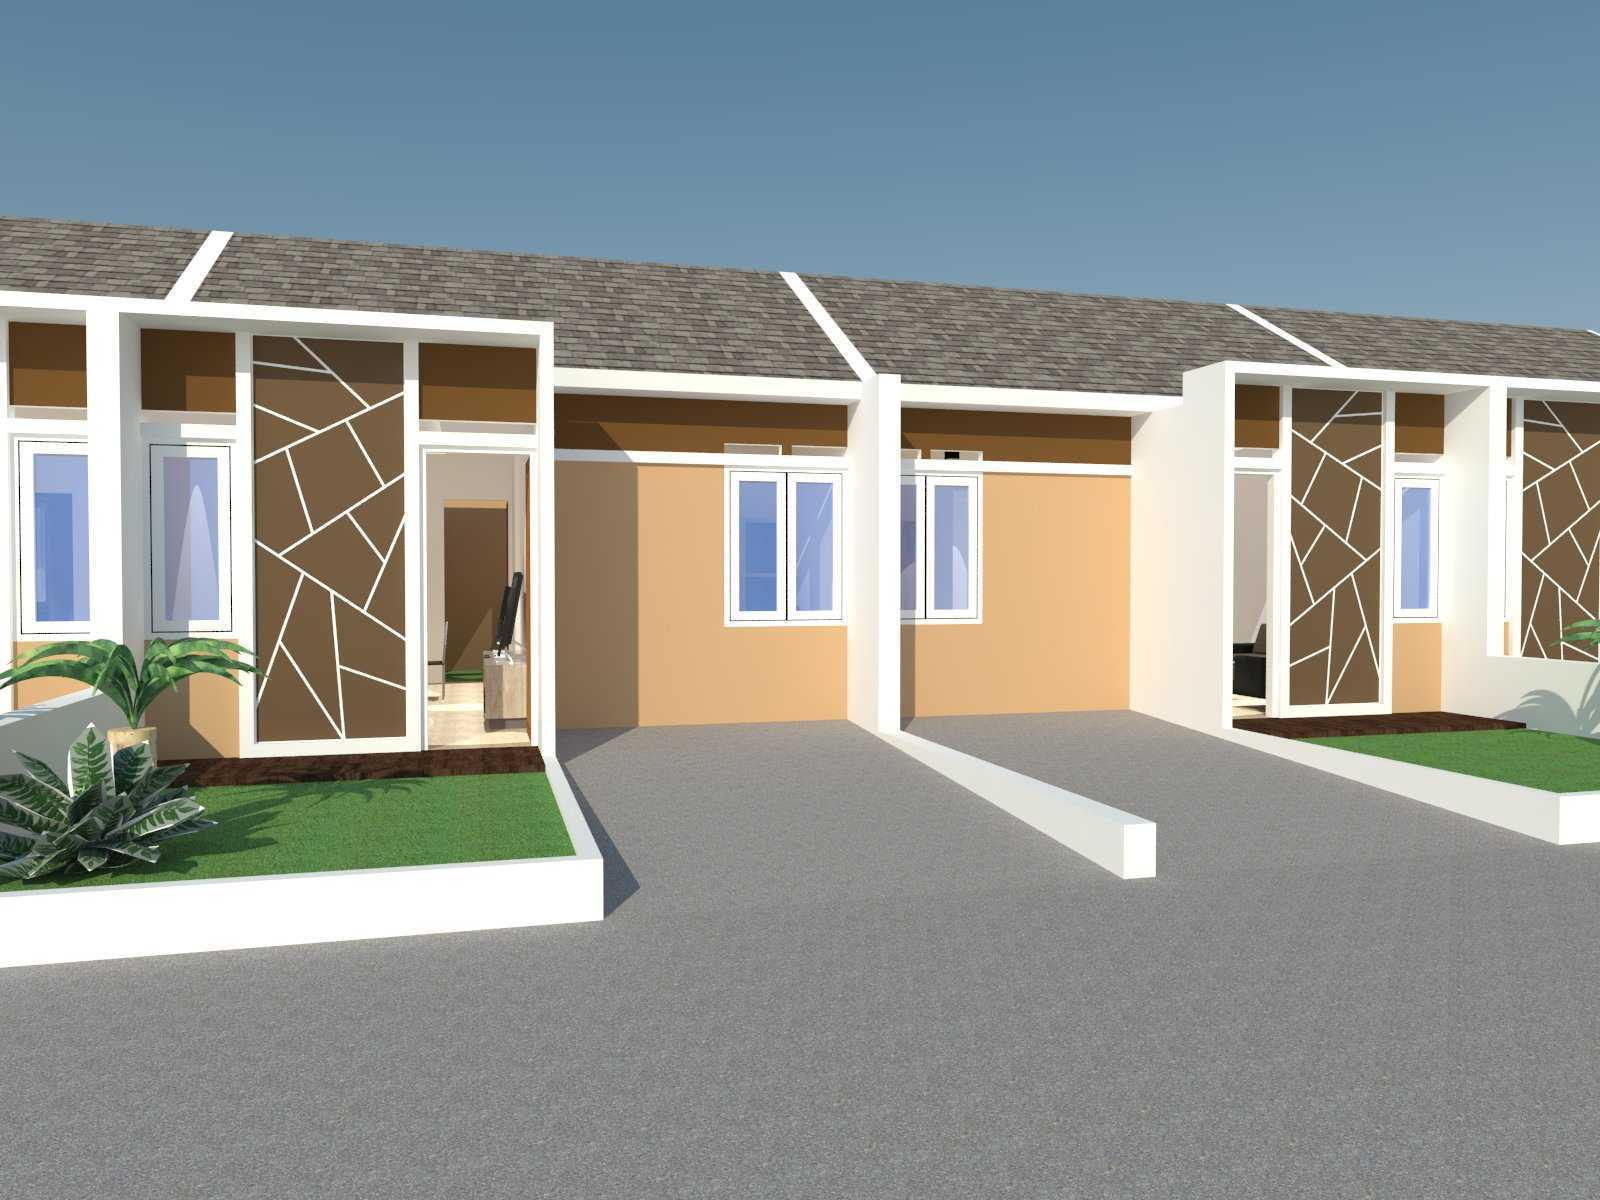 Photo Facade View Rumah Sederhana 6x12 6 desain arsitek ...